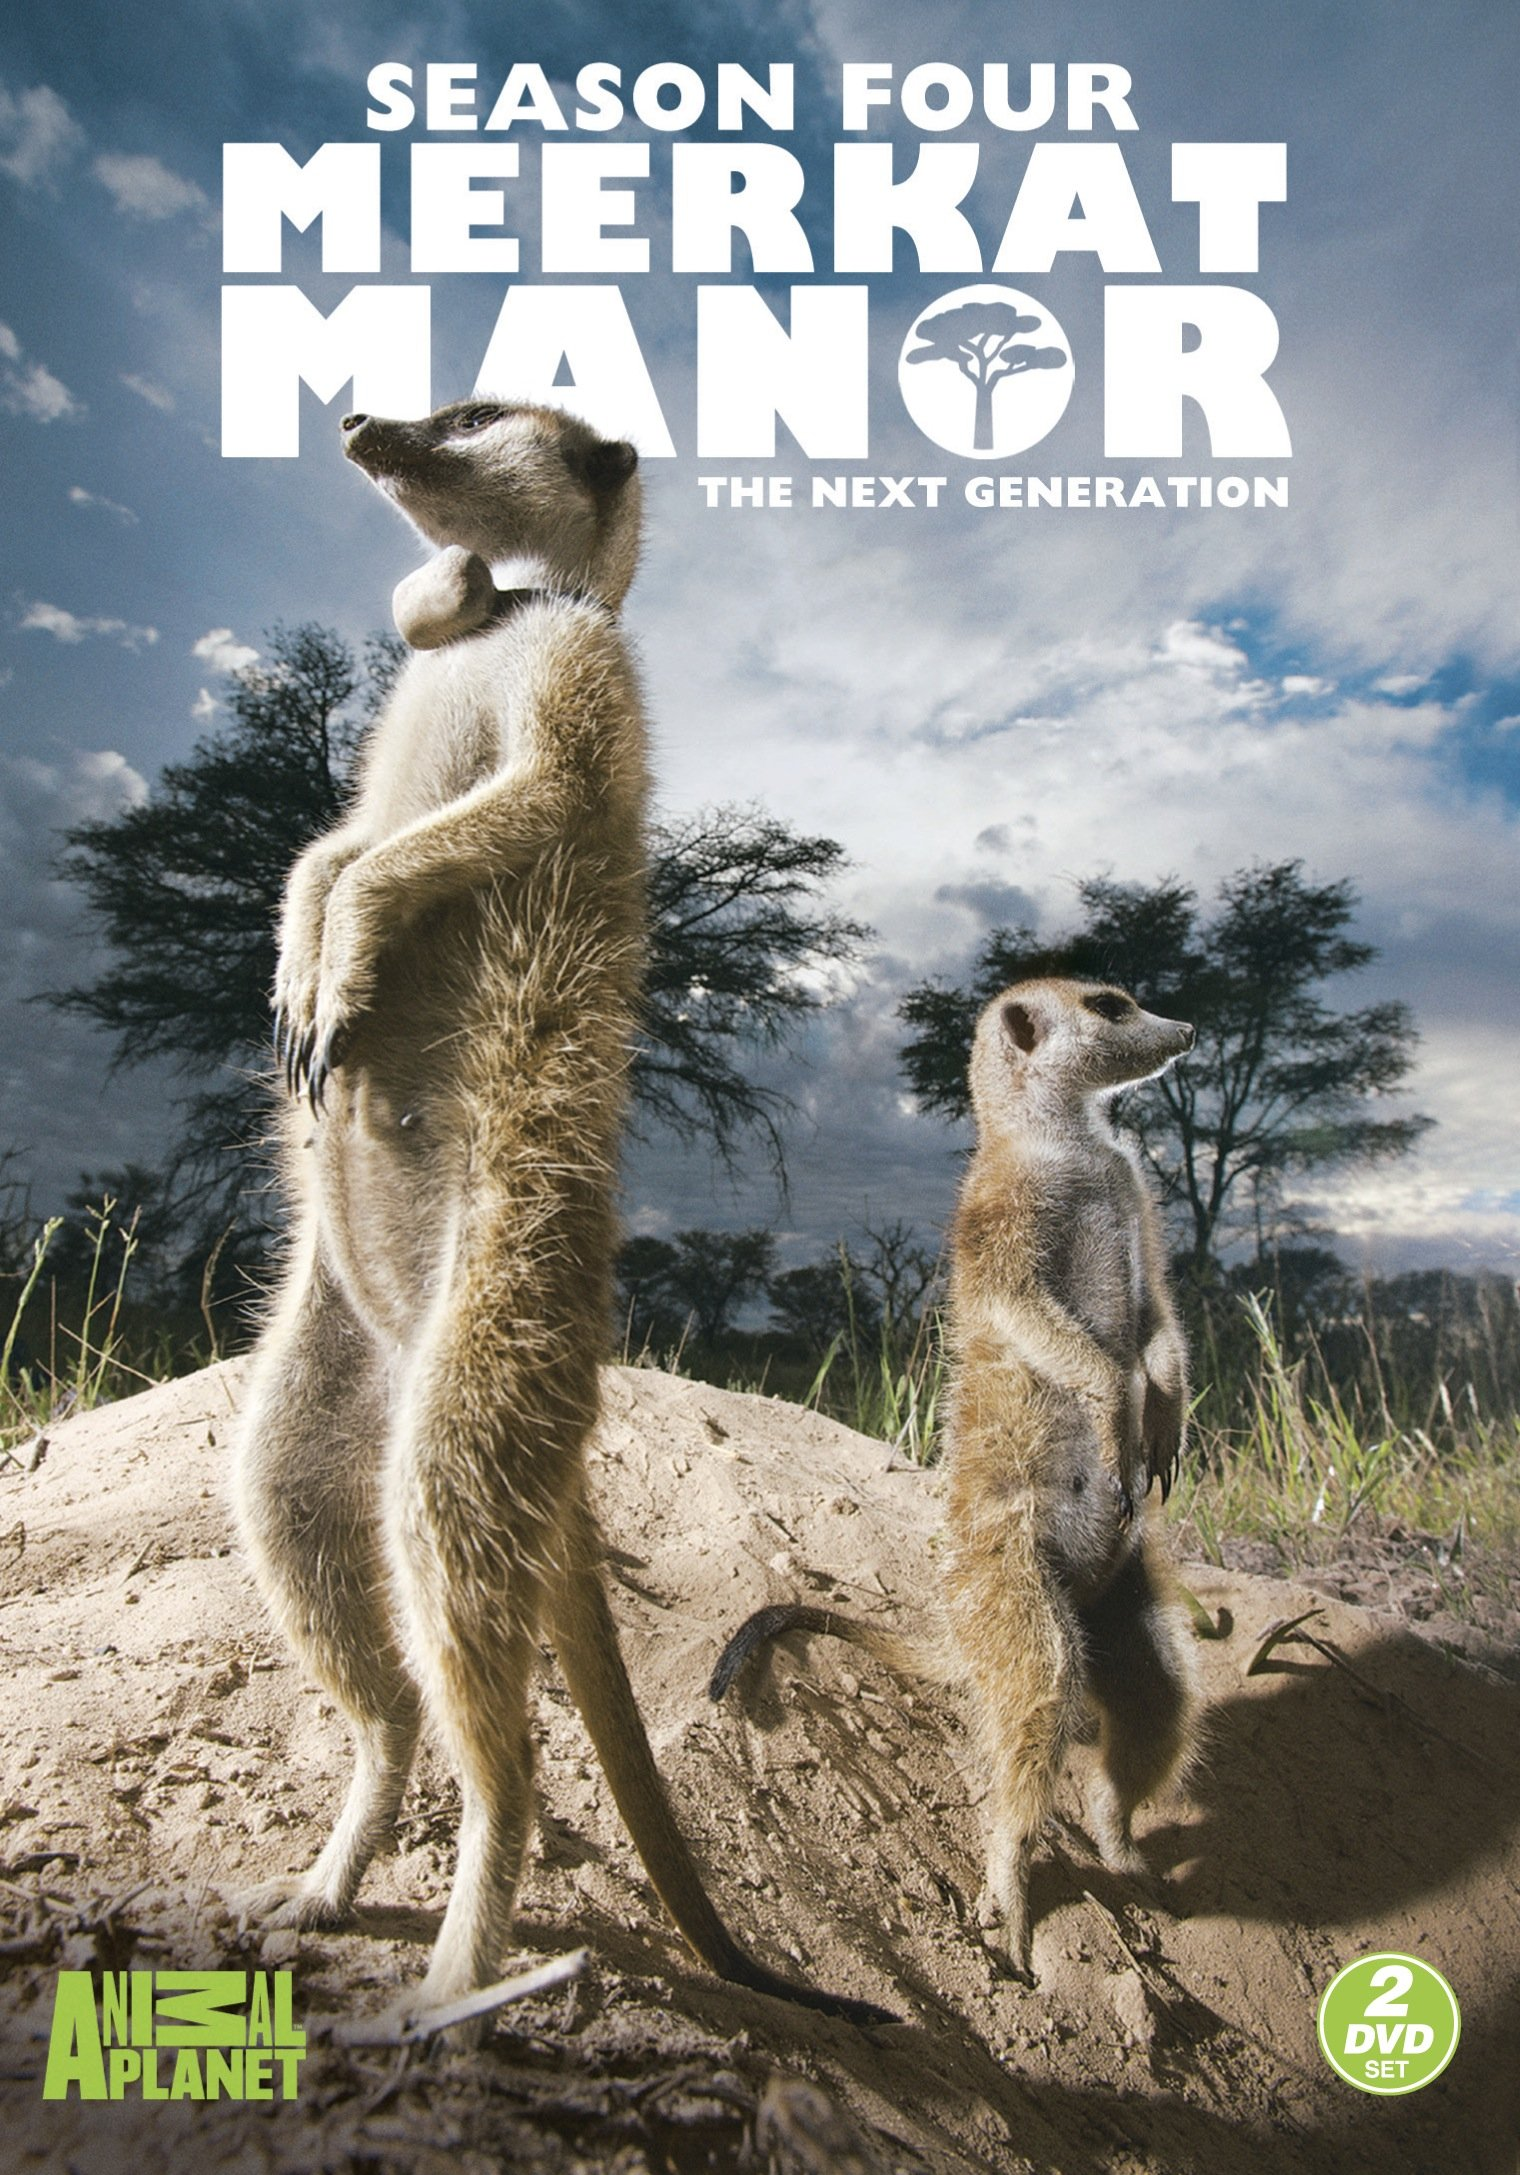 Meerkat Manor: Season 4 - The Next Generation